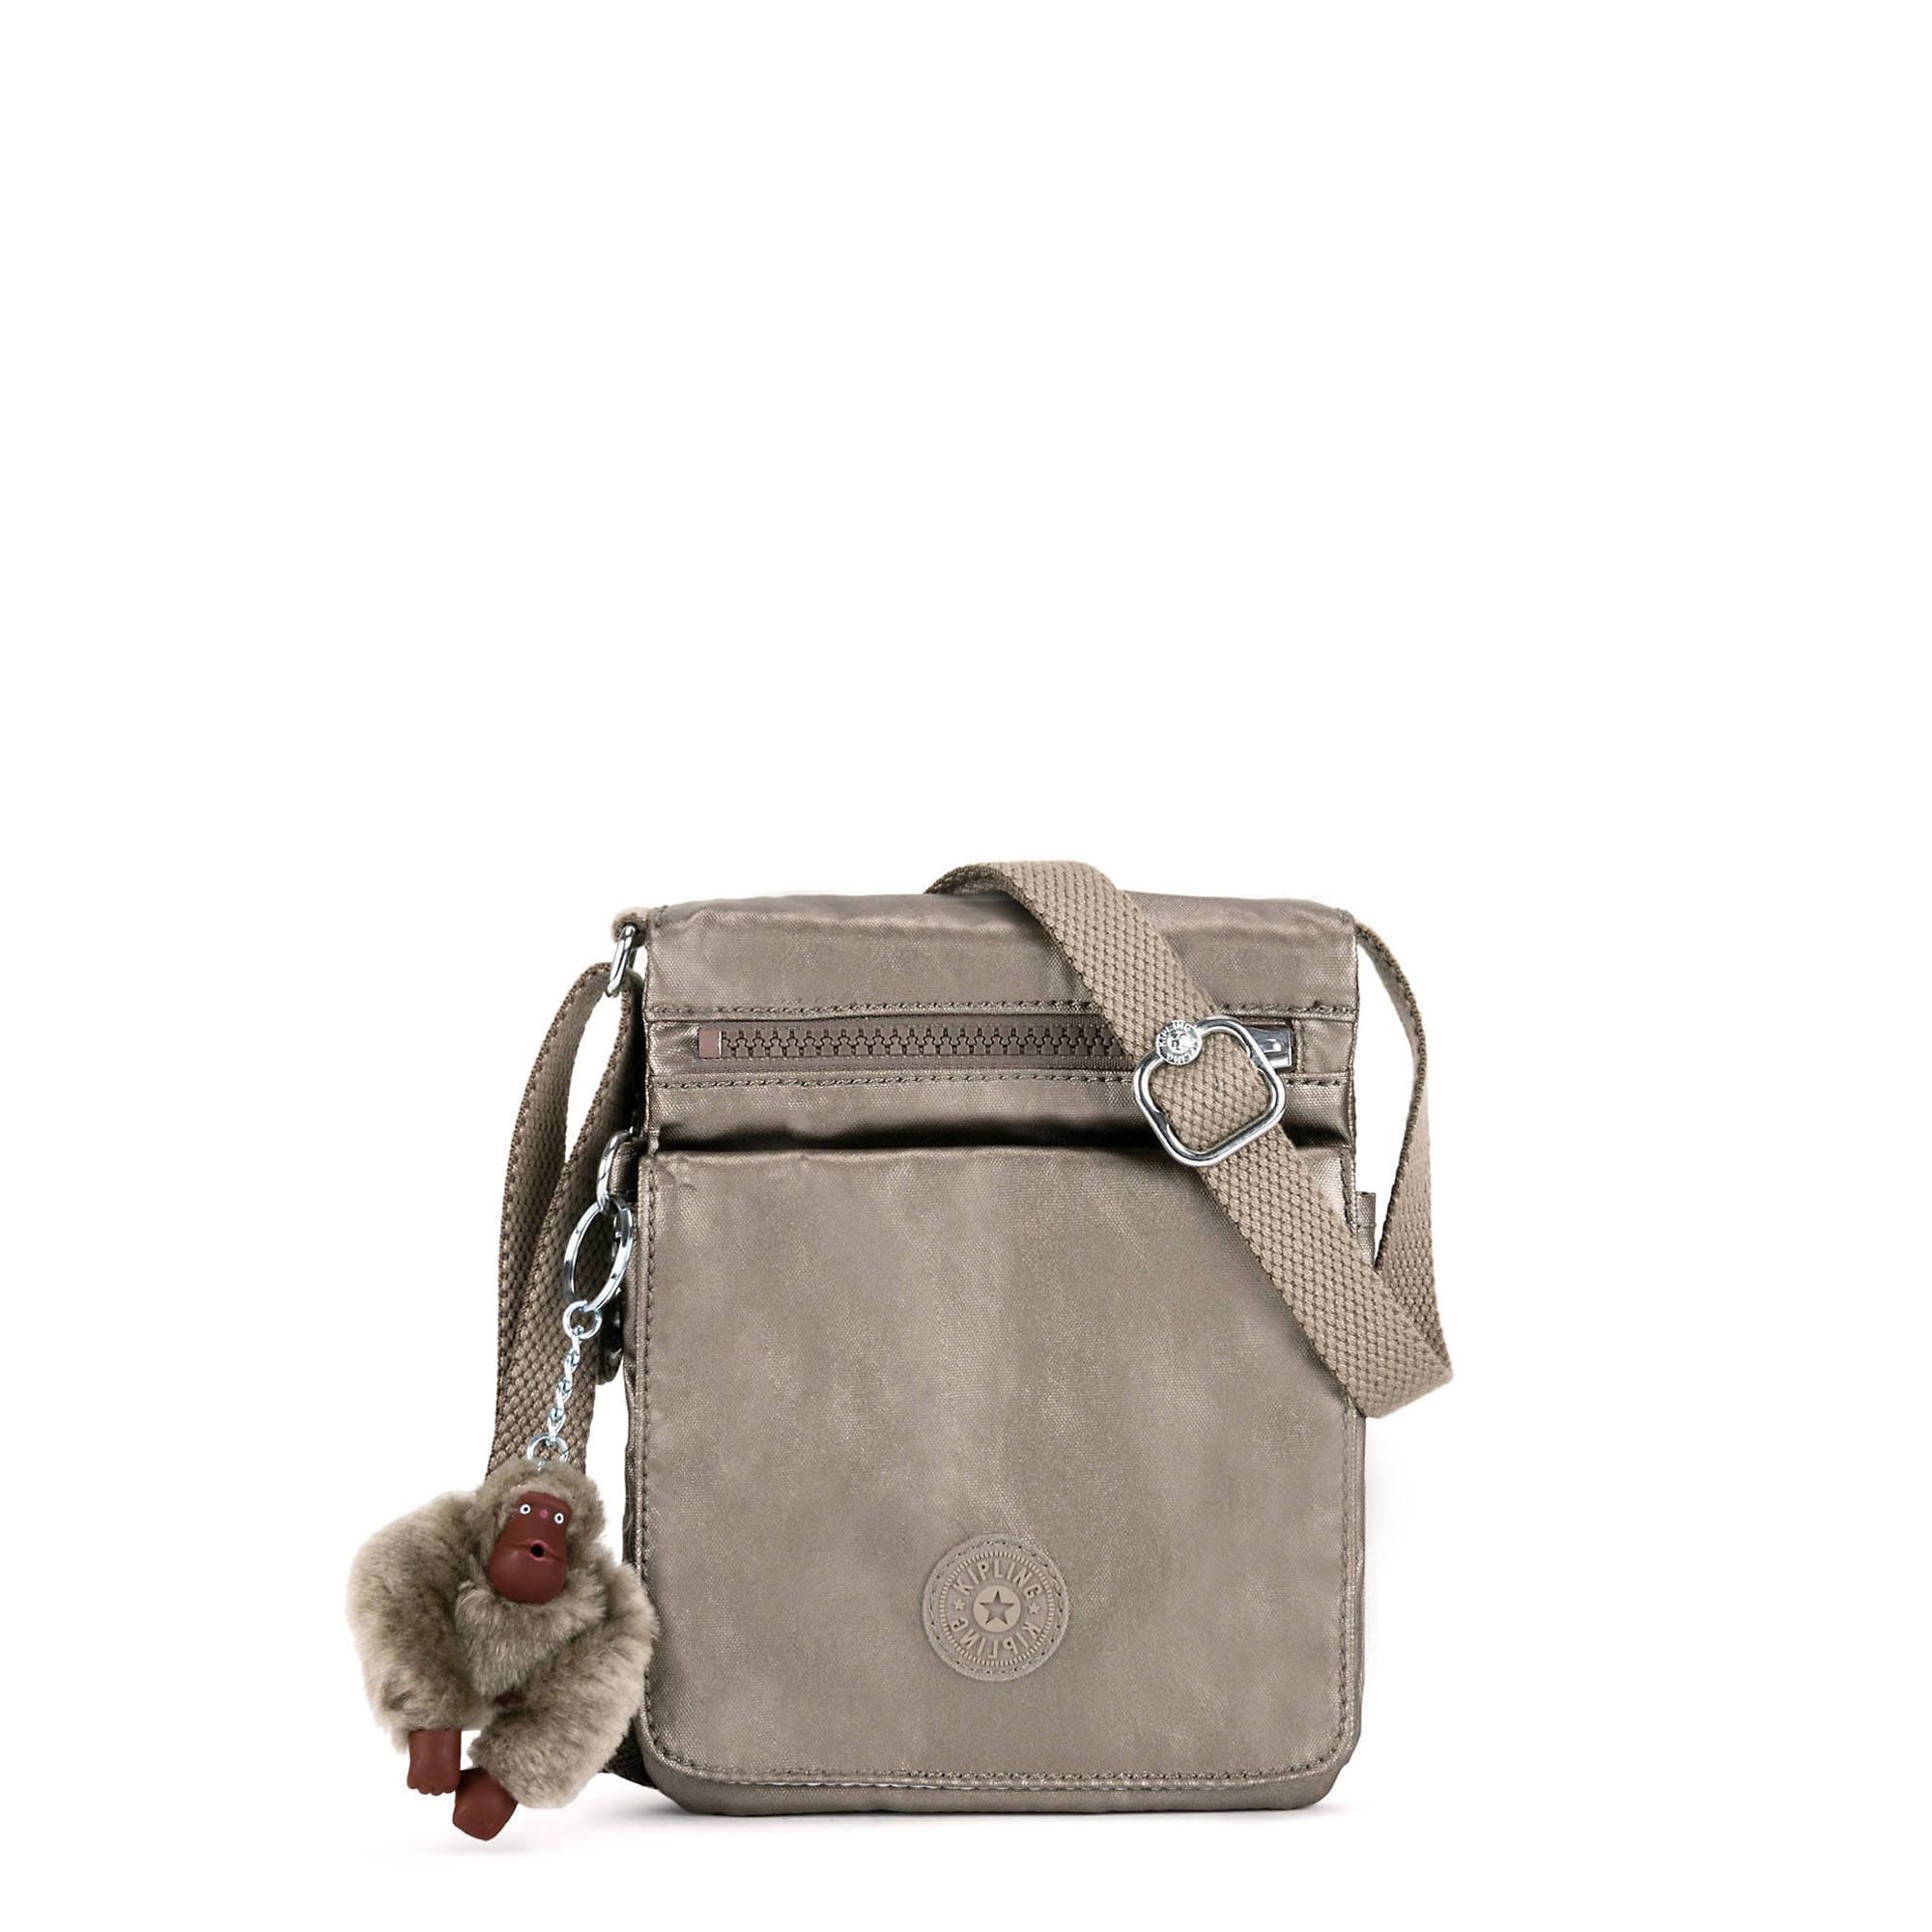 El Dorado Metallic Crossbody Bag Pewter Large